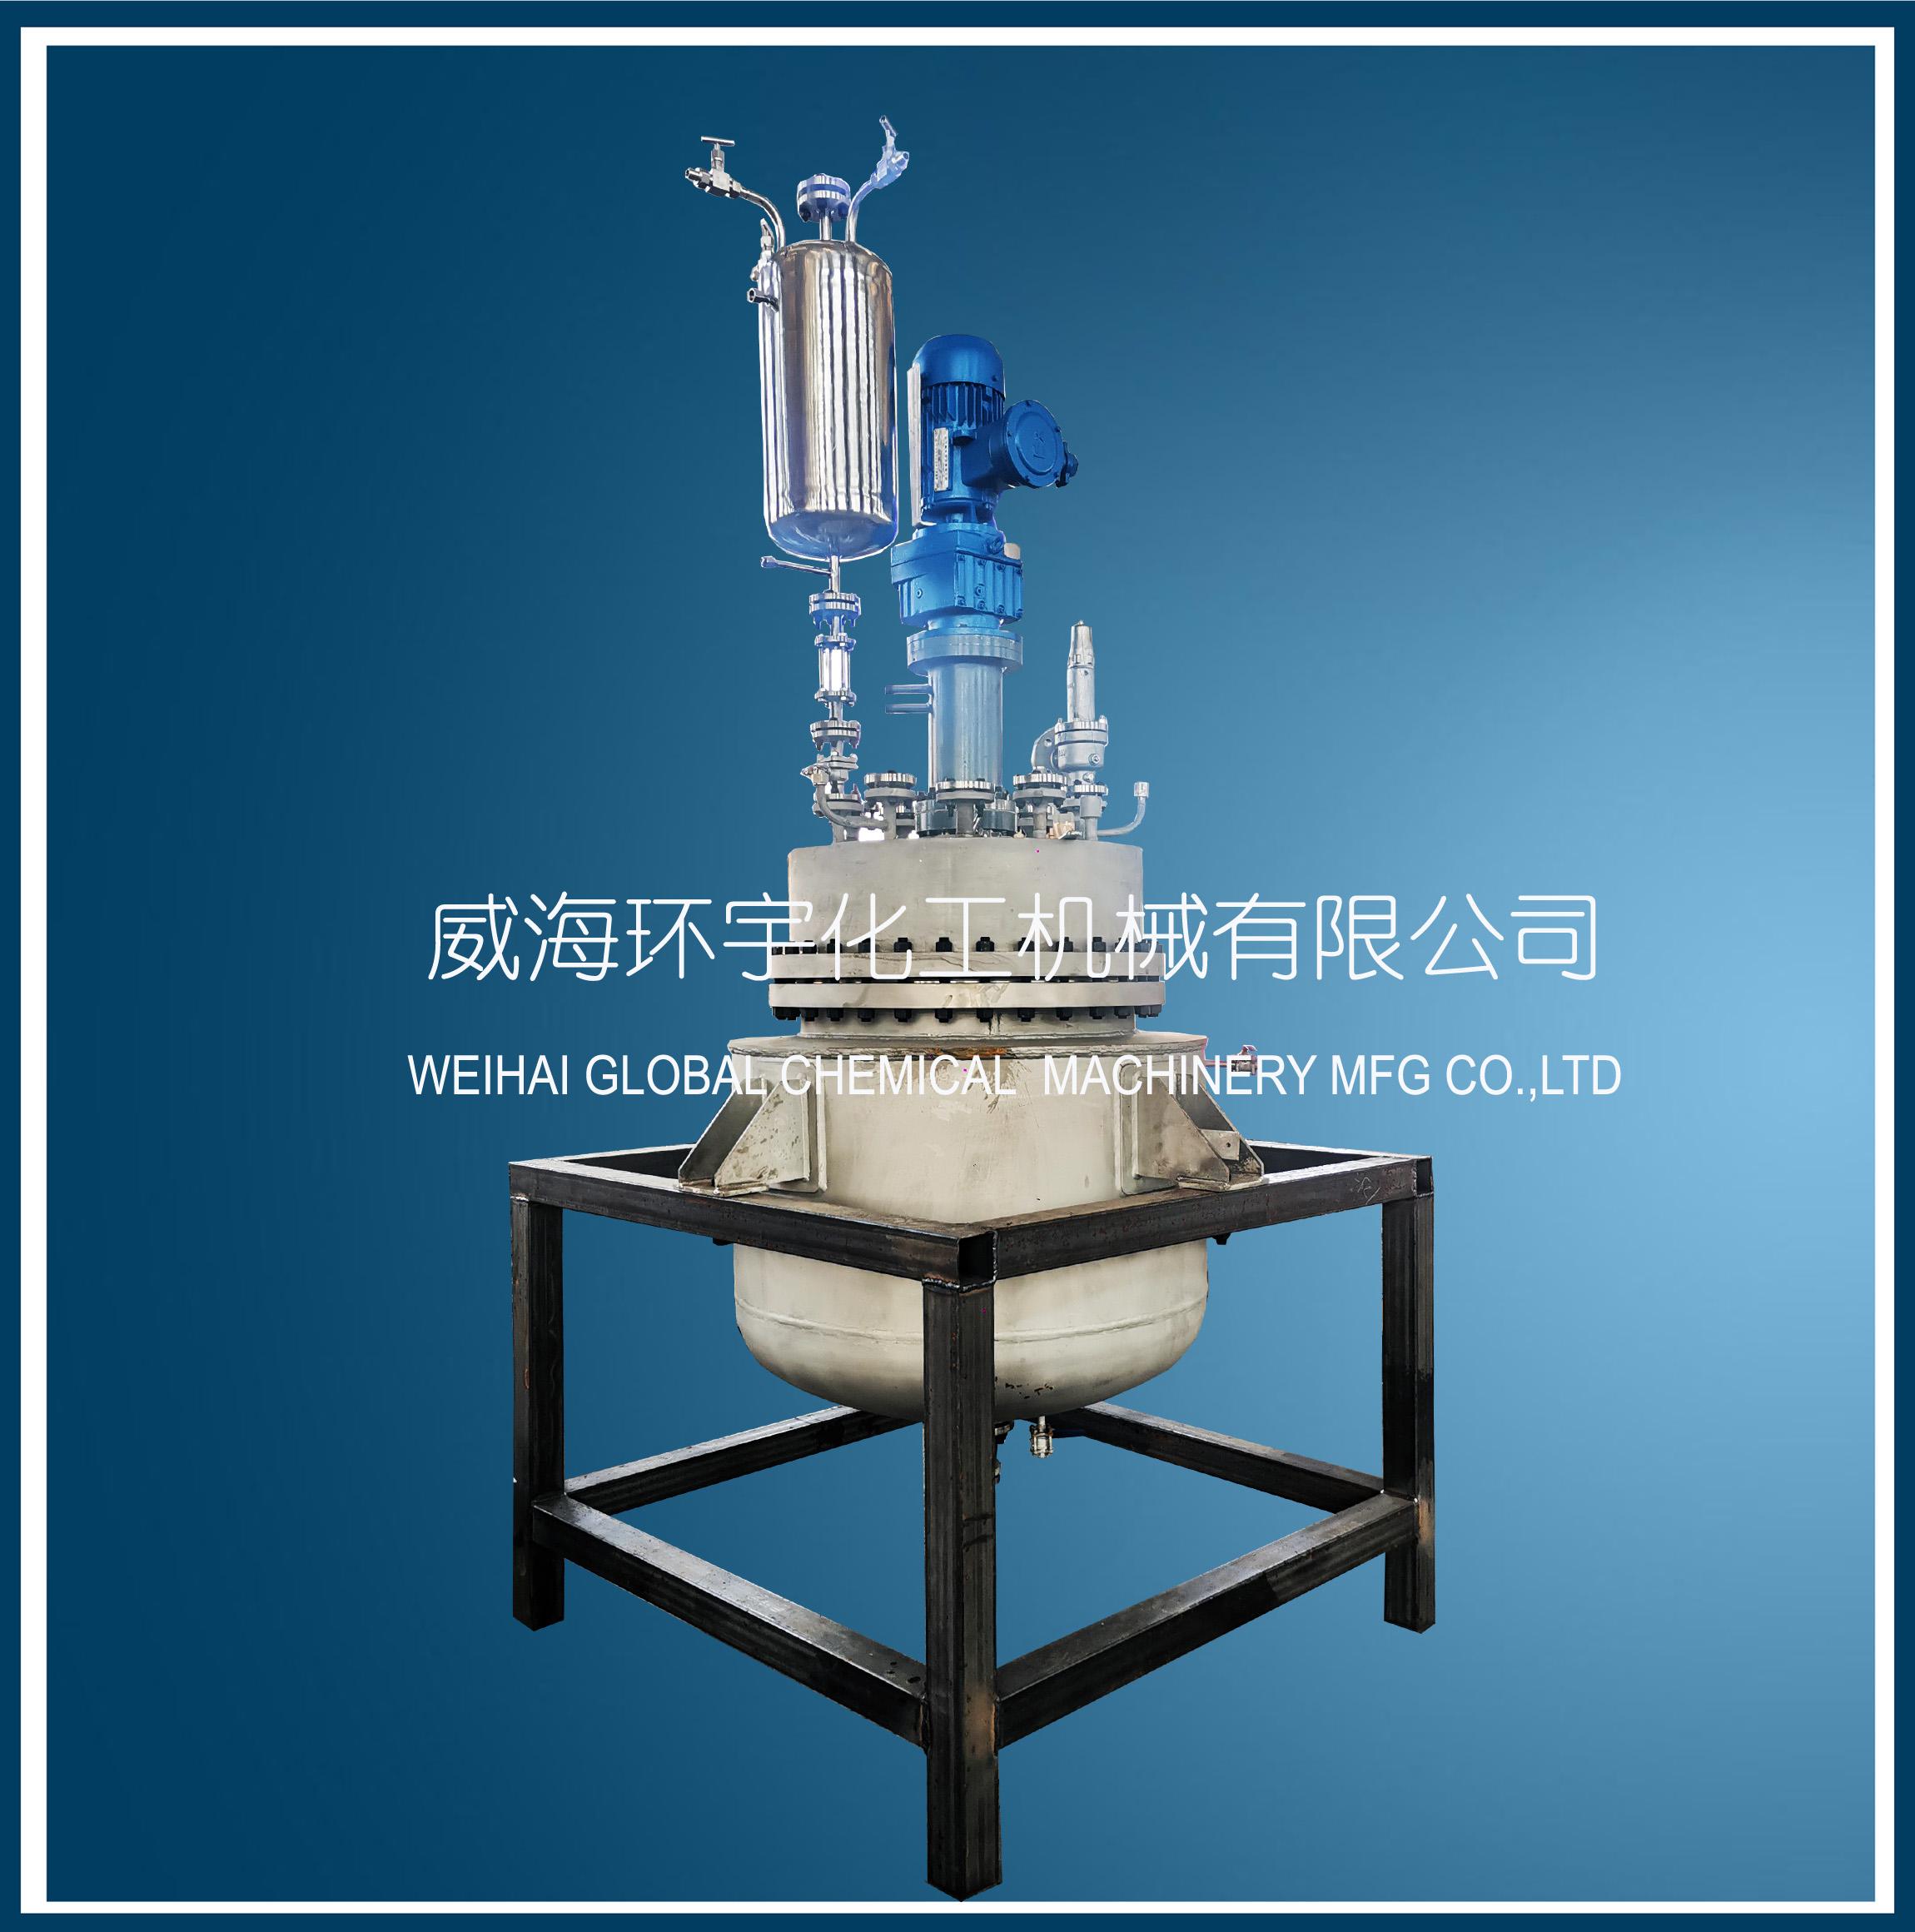 200L哈氏合金低温反应釜已顺利完工发往株洲客户处